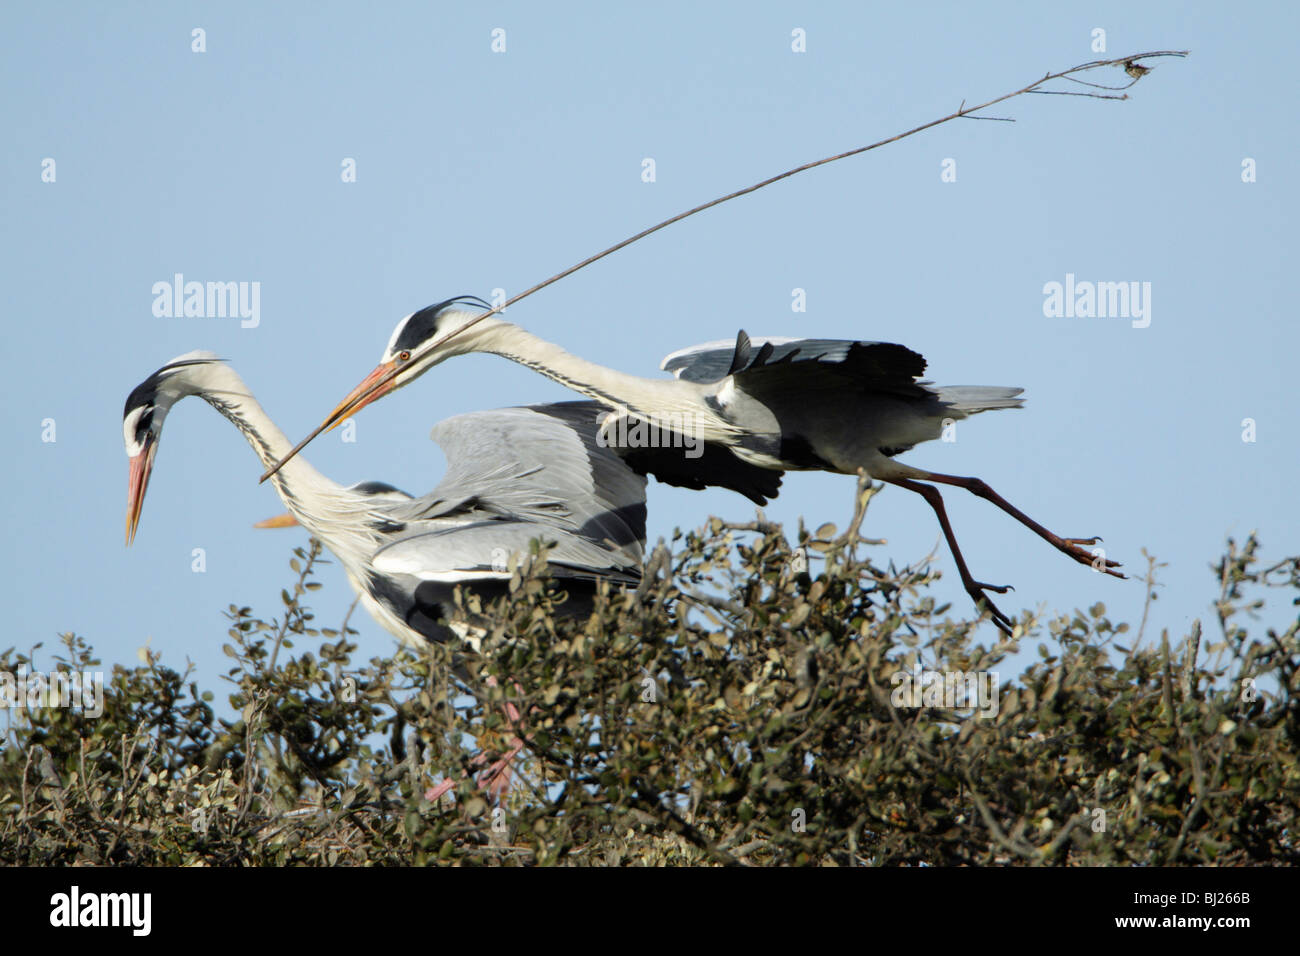 Graureiher (Ardea Cinerea), im Flug landet auf dem Nest mit Nistmaterial, Portugal Stockbild